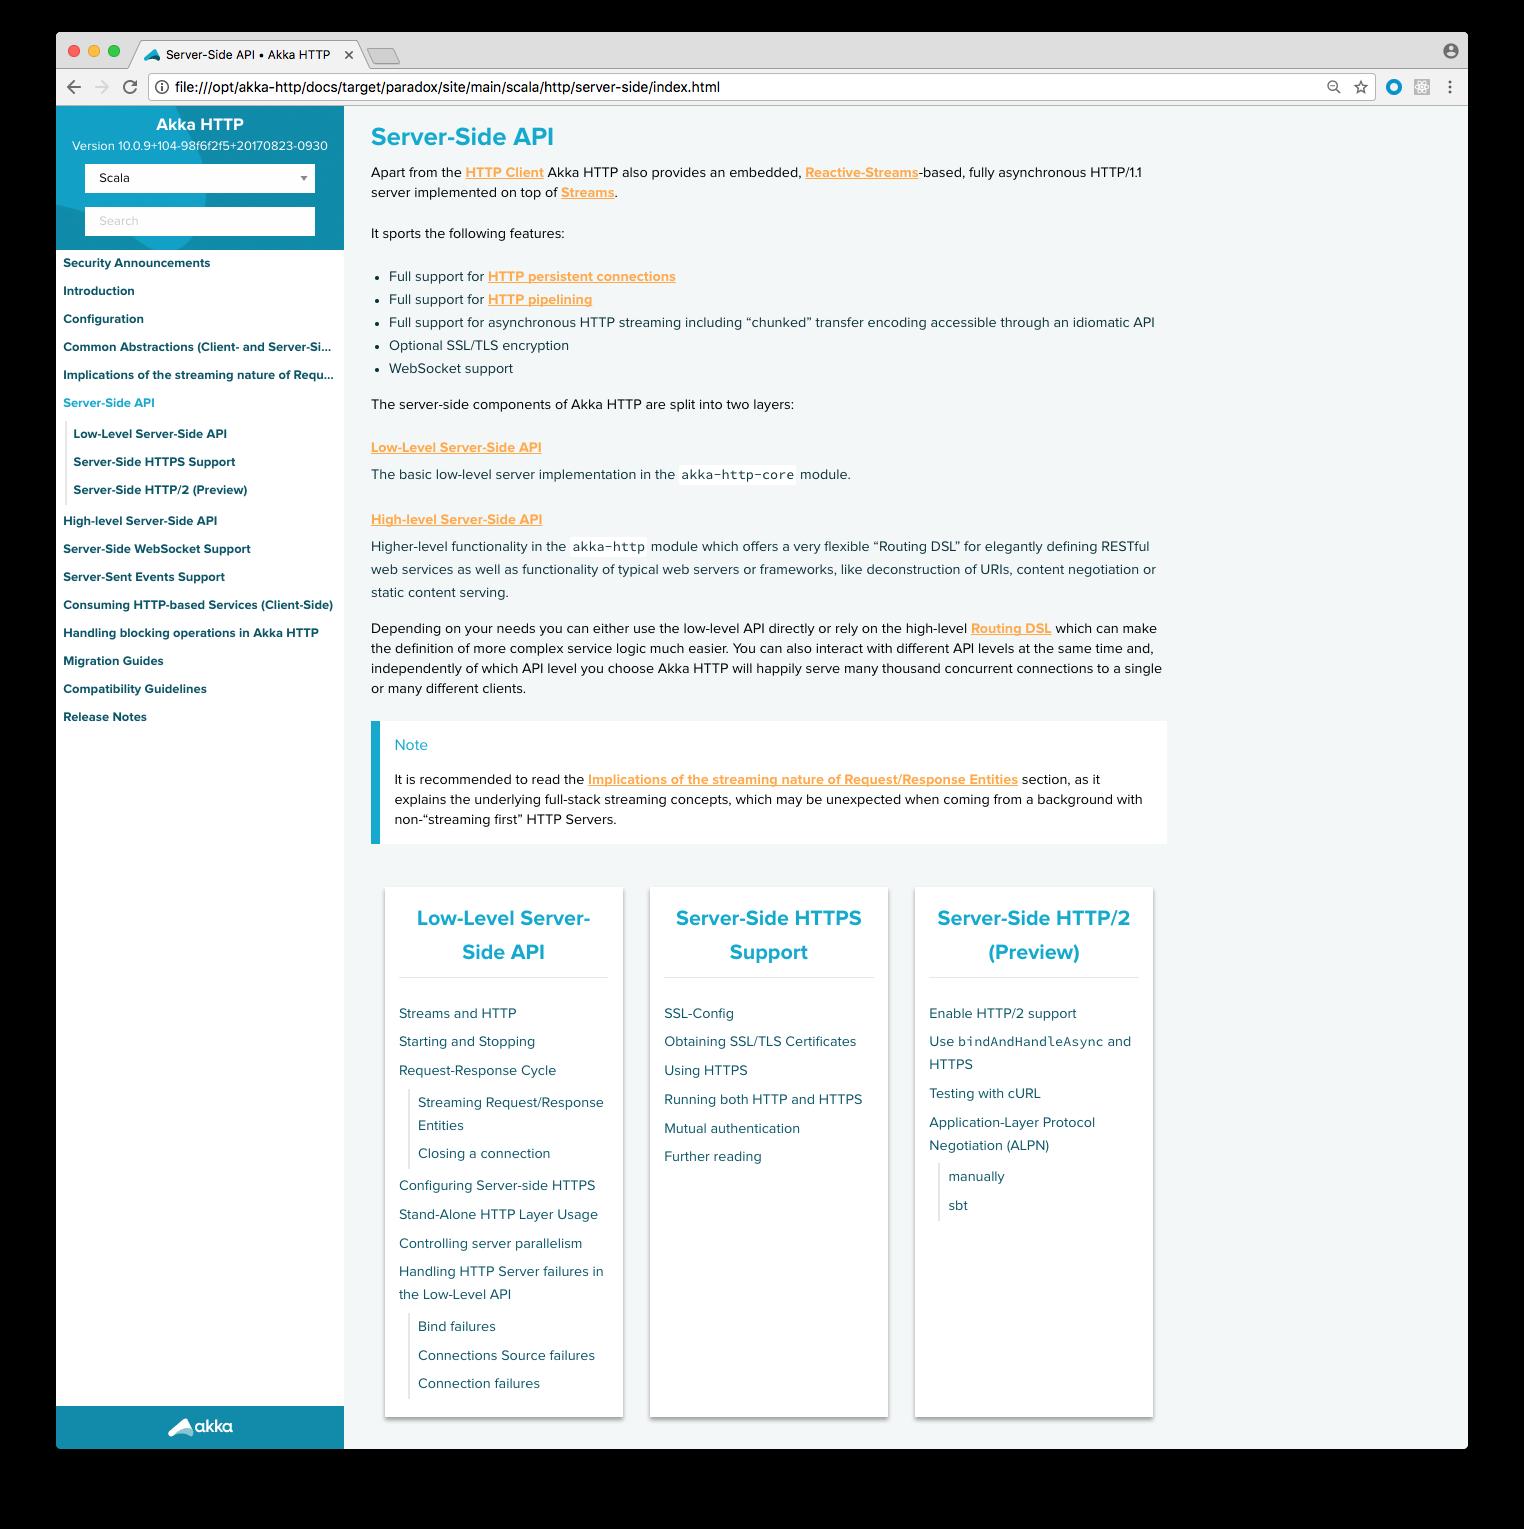 doc Add server-side overview page · Issue #1371 · akka/akka